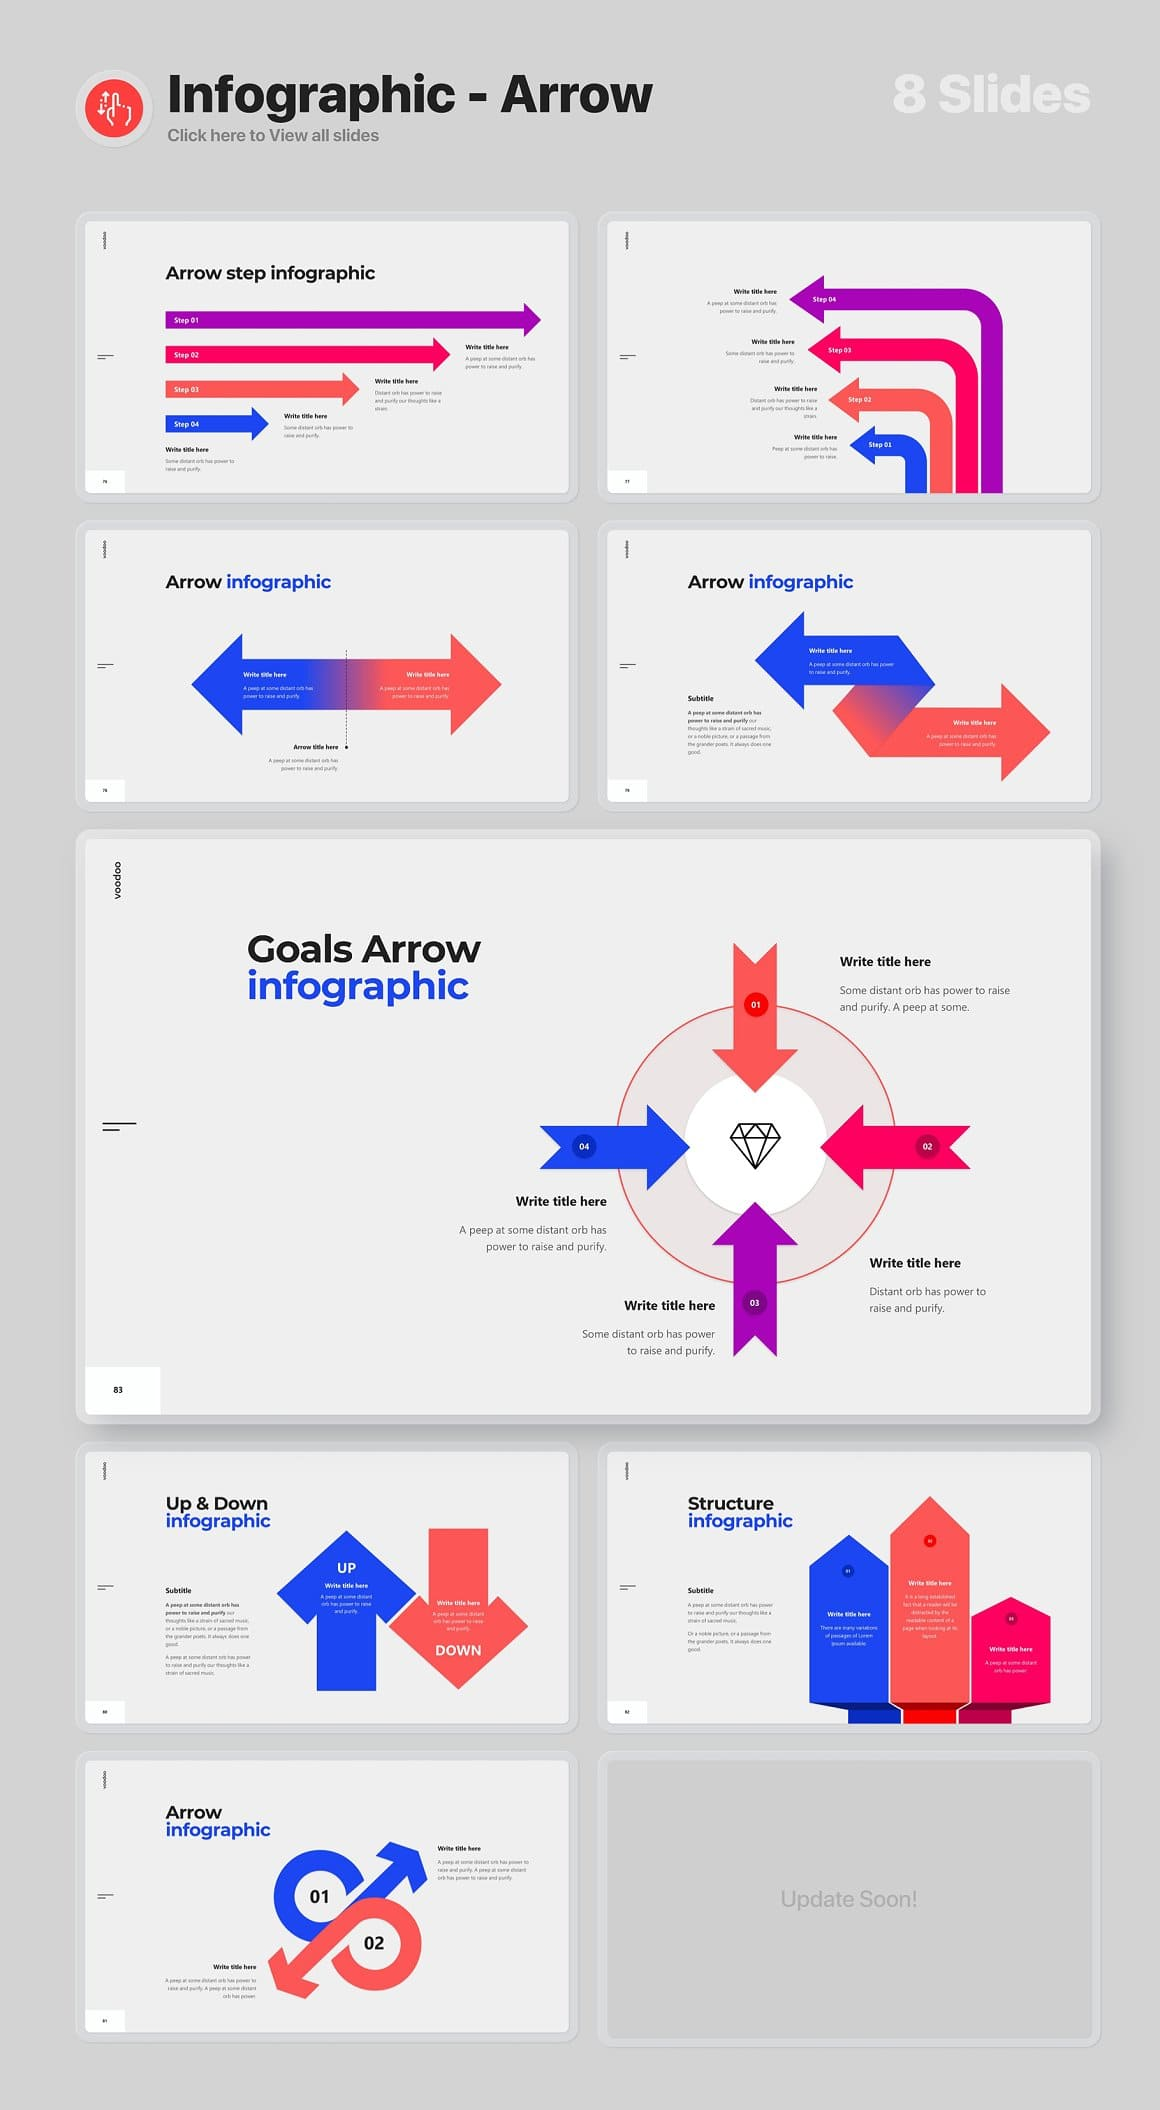 8 Slides Infographic - Arrow Voodoo Presentation 4.0.